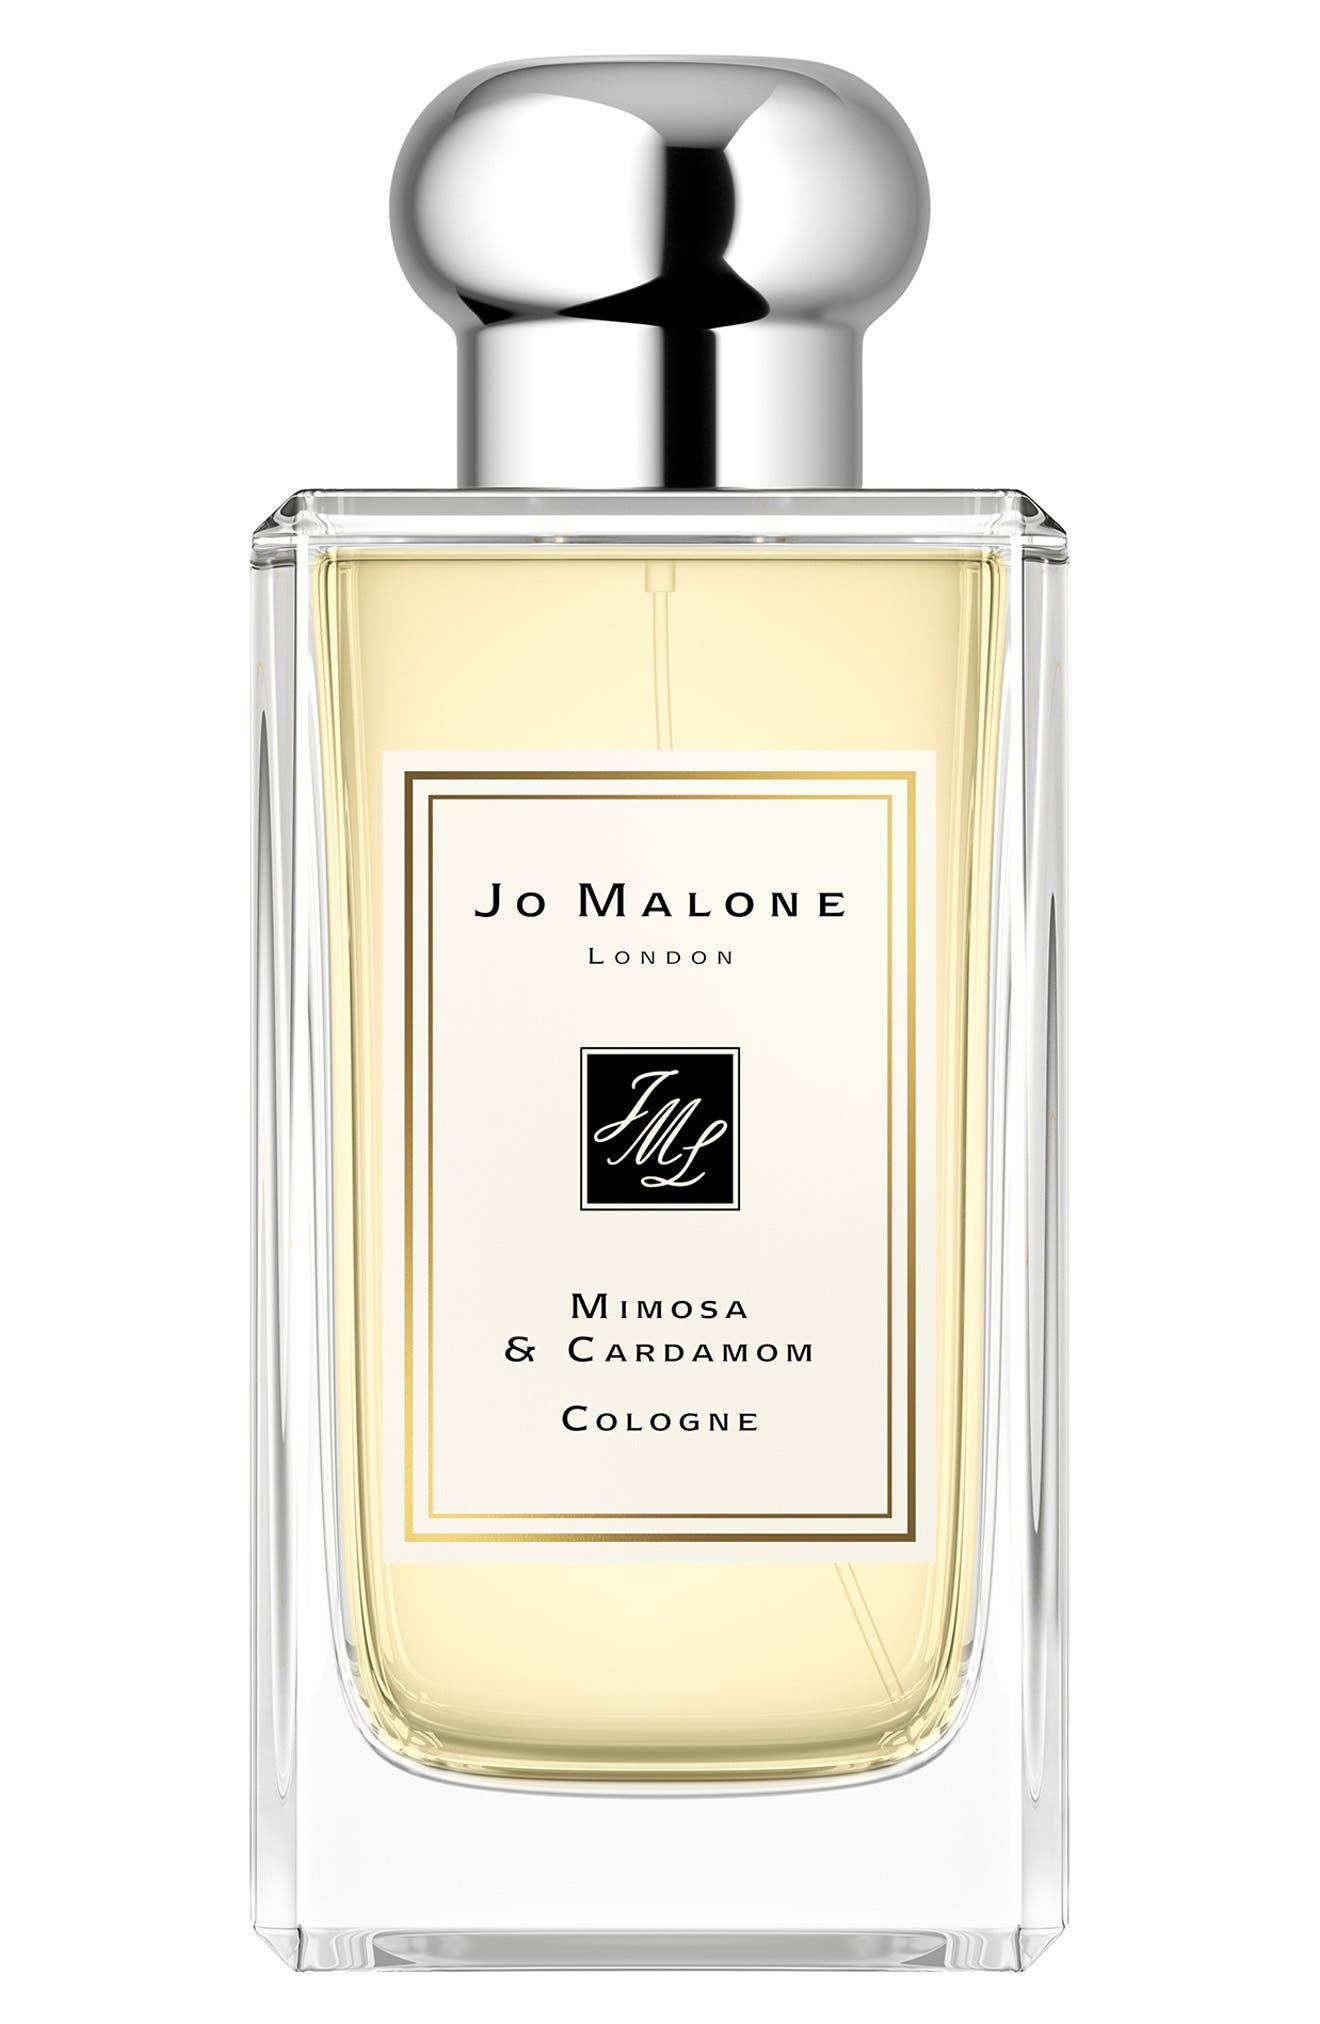 Jo Malone London(TM) Mimosa & Cardamom Cologne